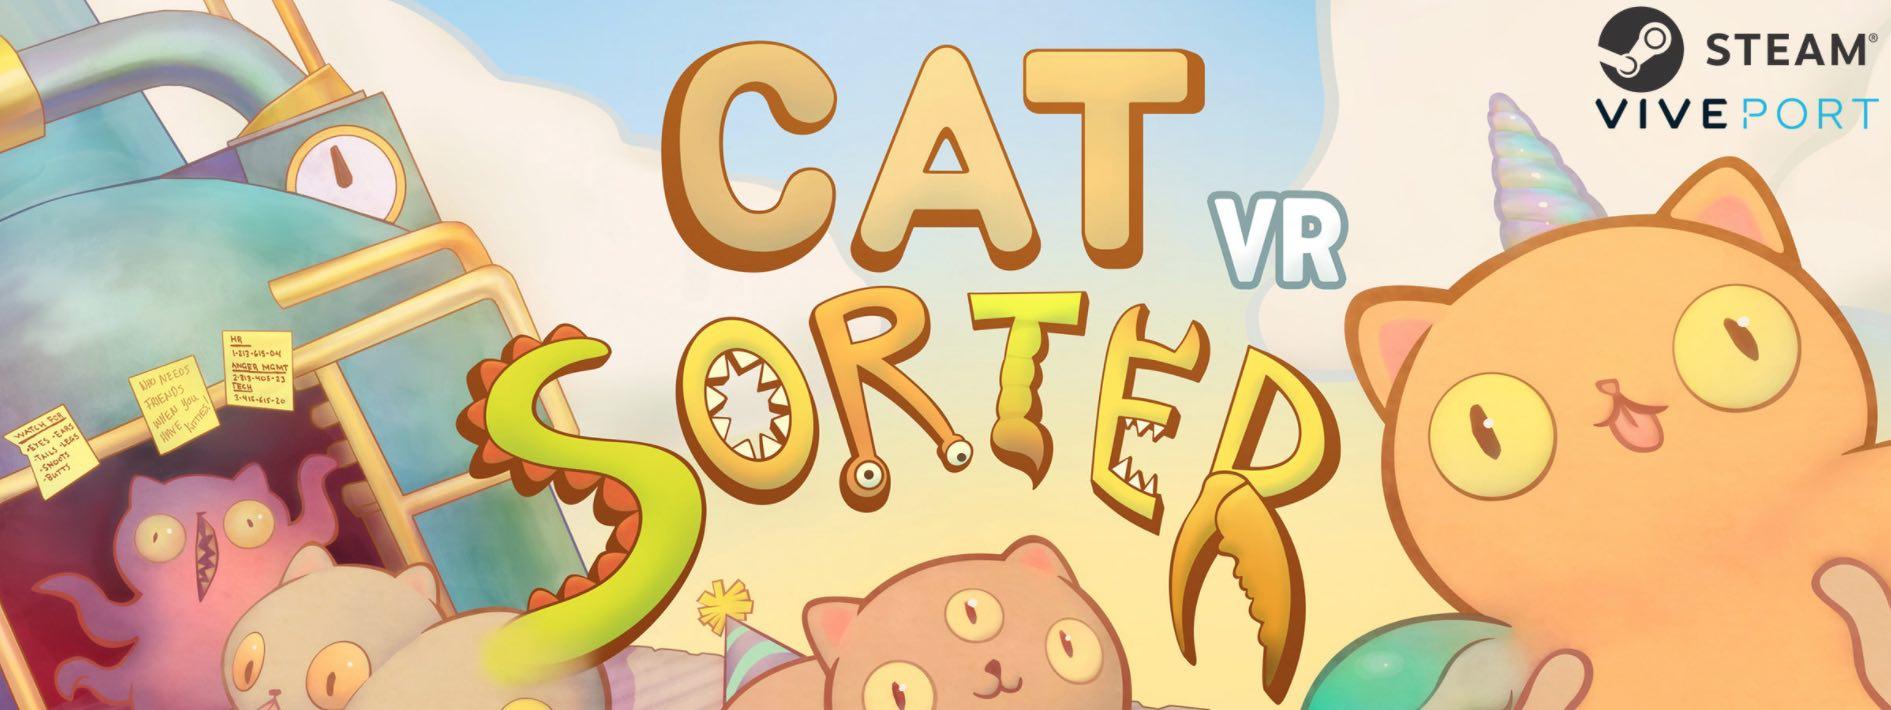 Cat_Sorter_VR_Pyramind